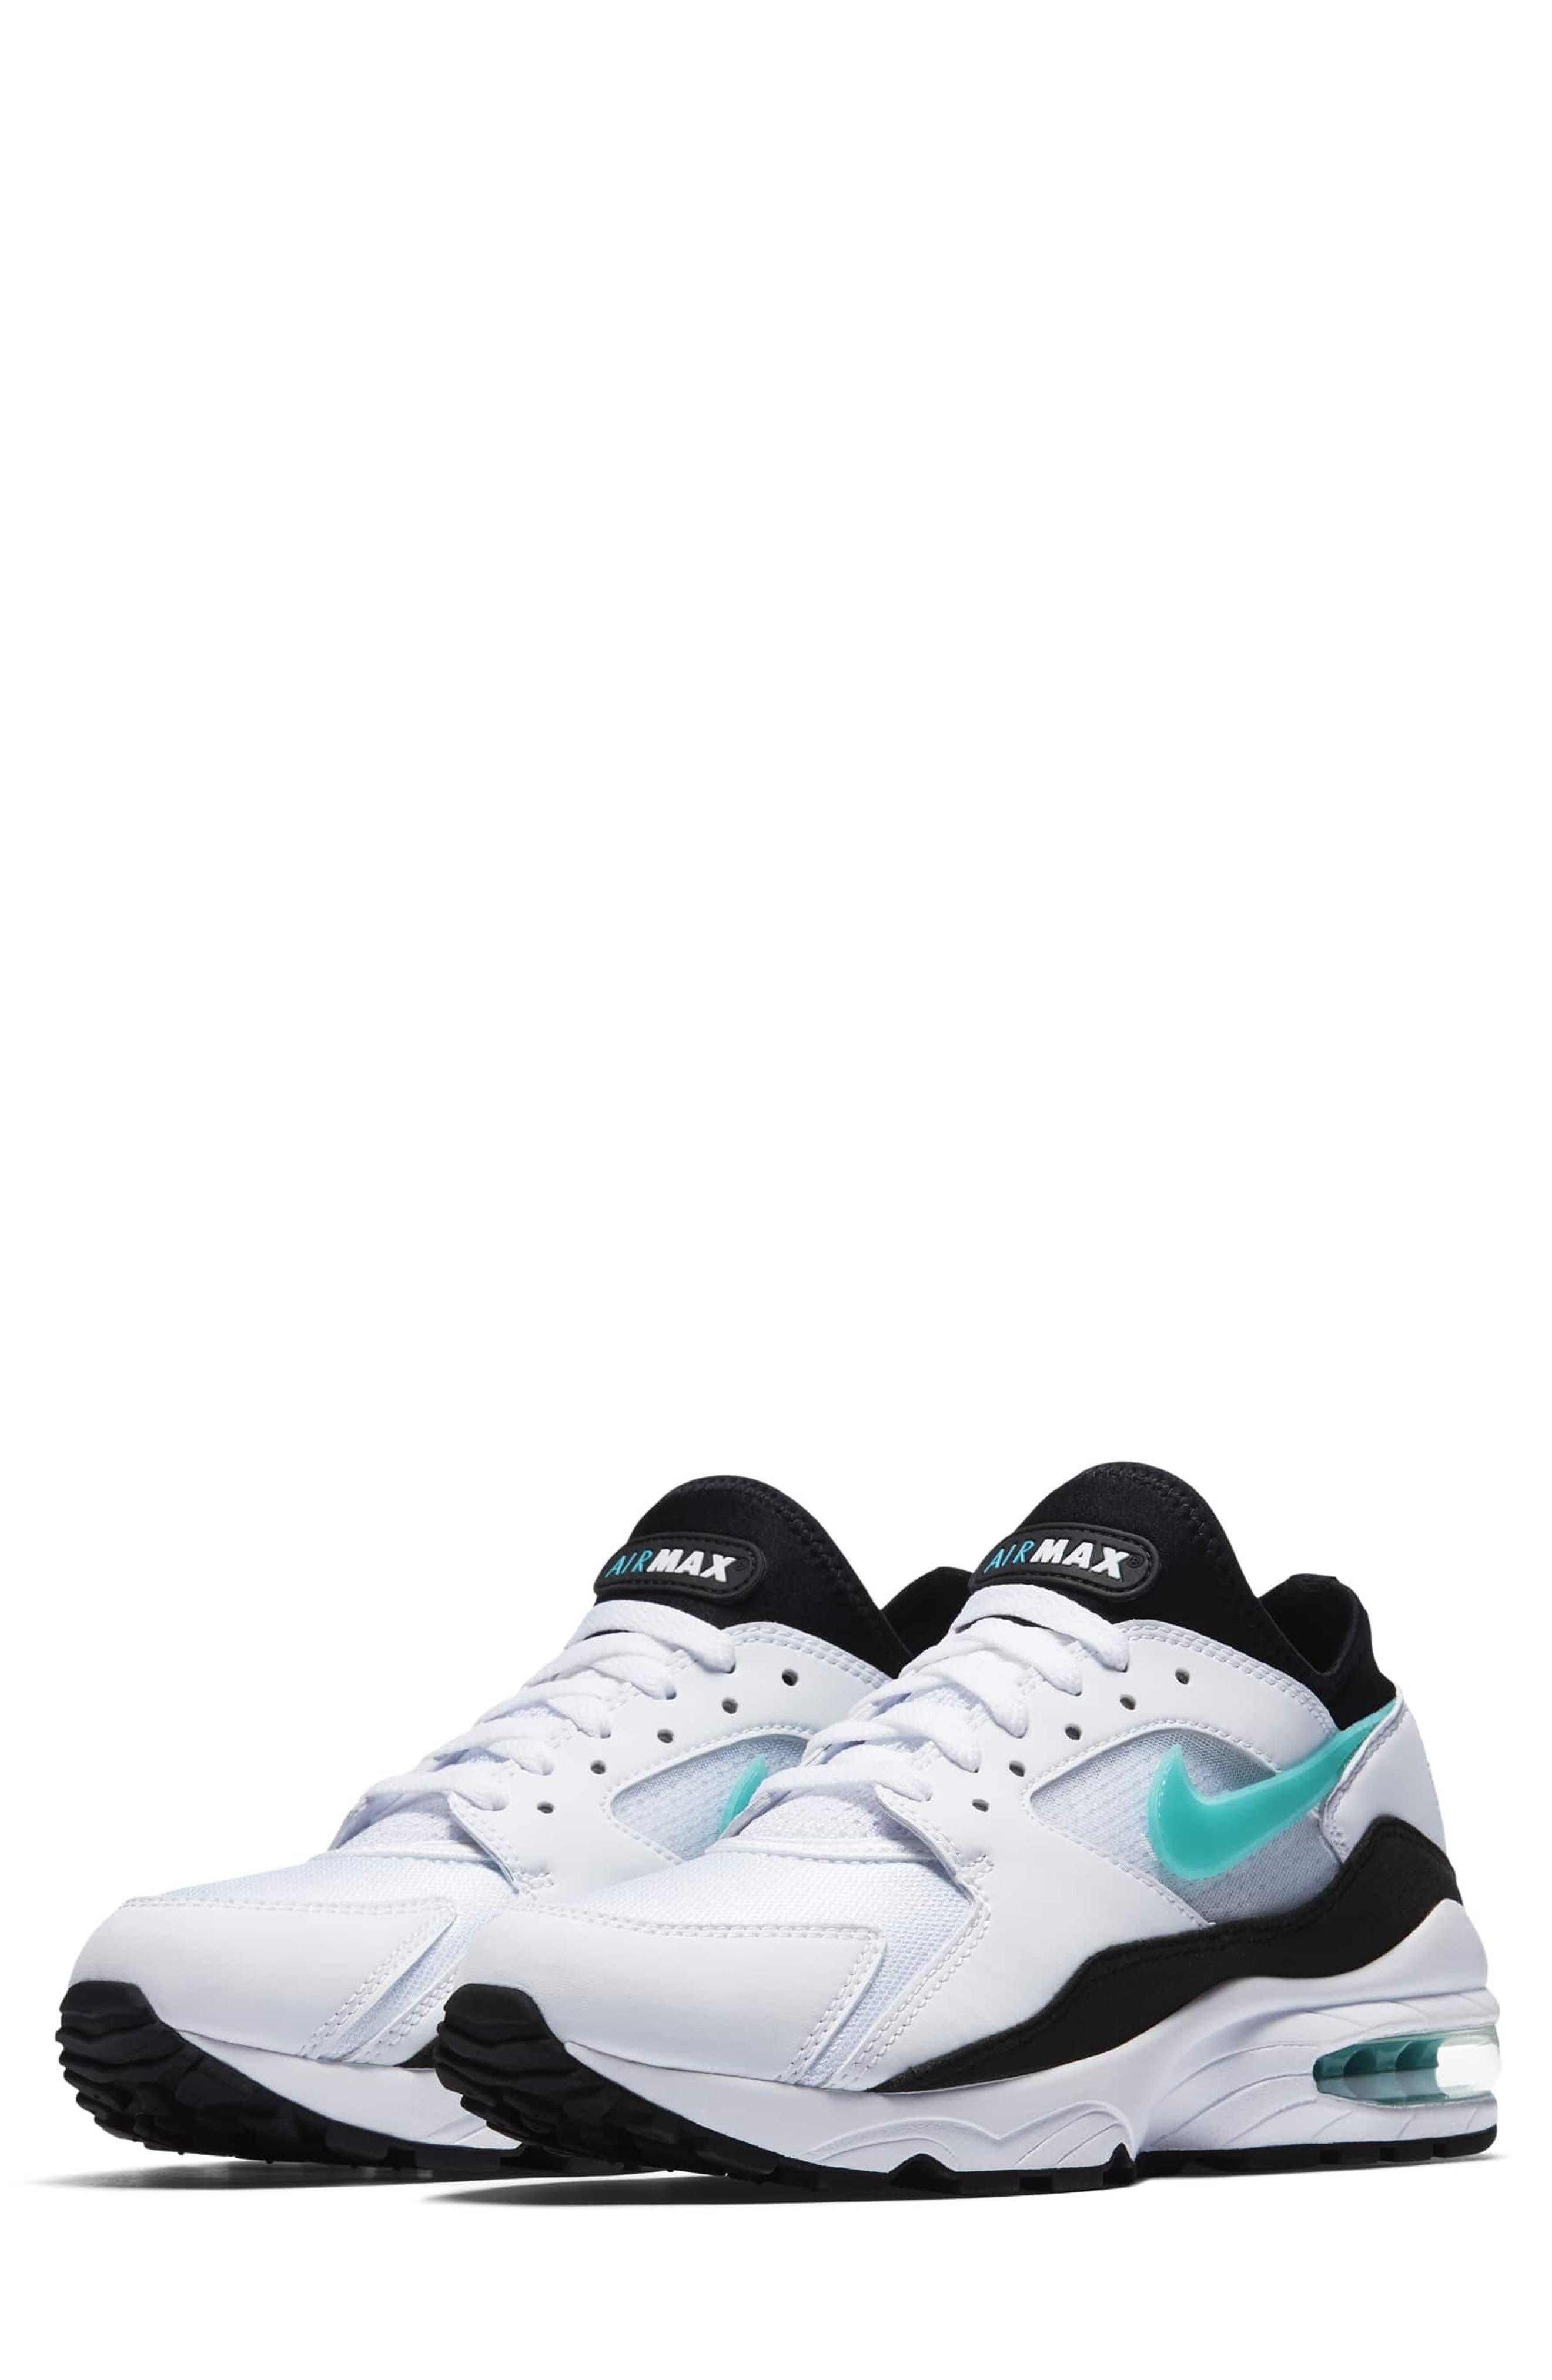 Air Max 93 Sneaker,                             Main thumbnail 1, color,                             WHITE/ DUSTY CACTUS